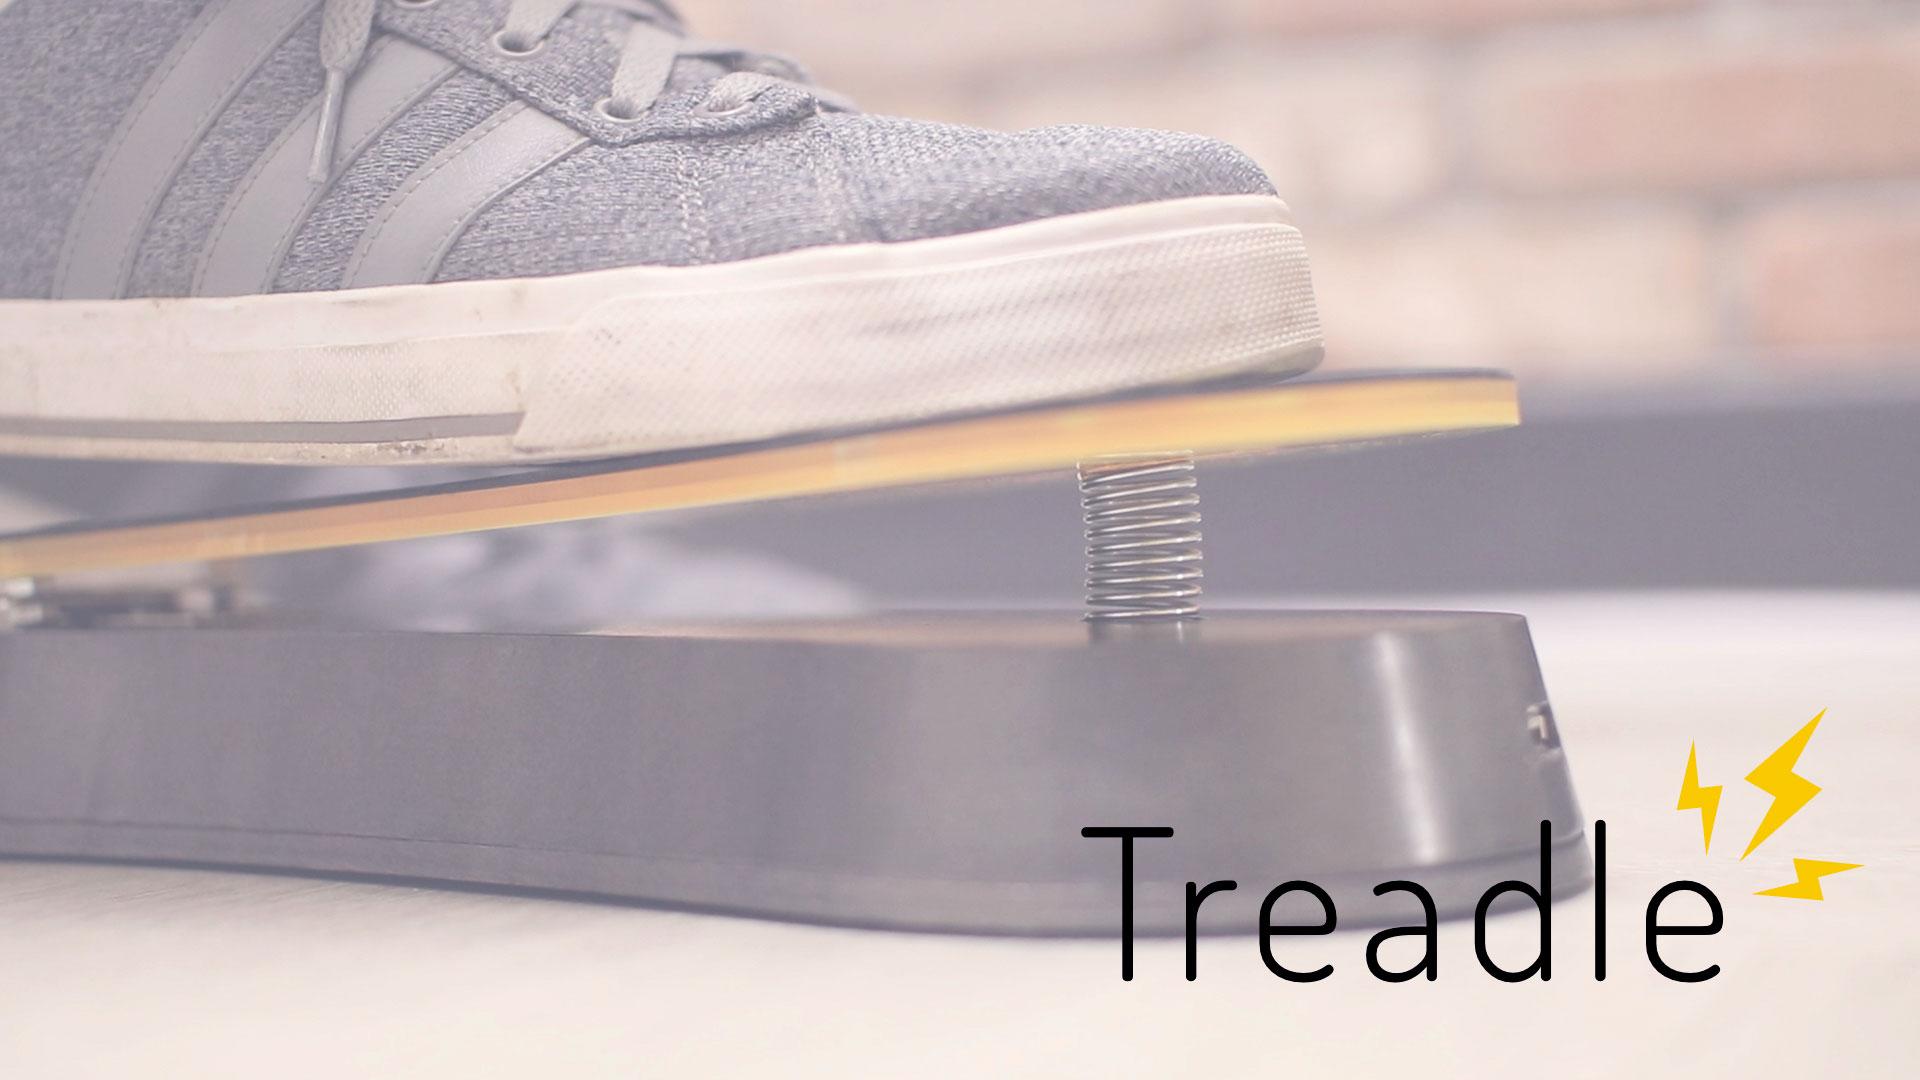 Treadle_title_forblog.jpg